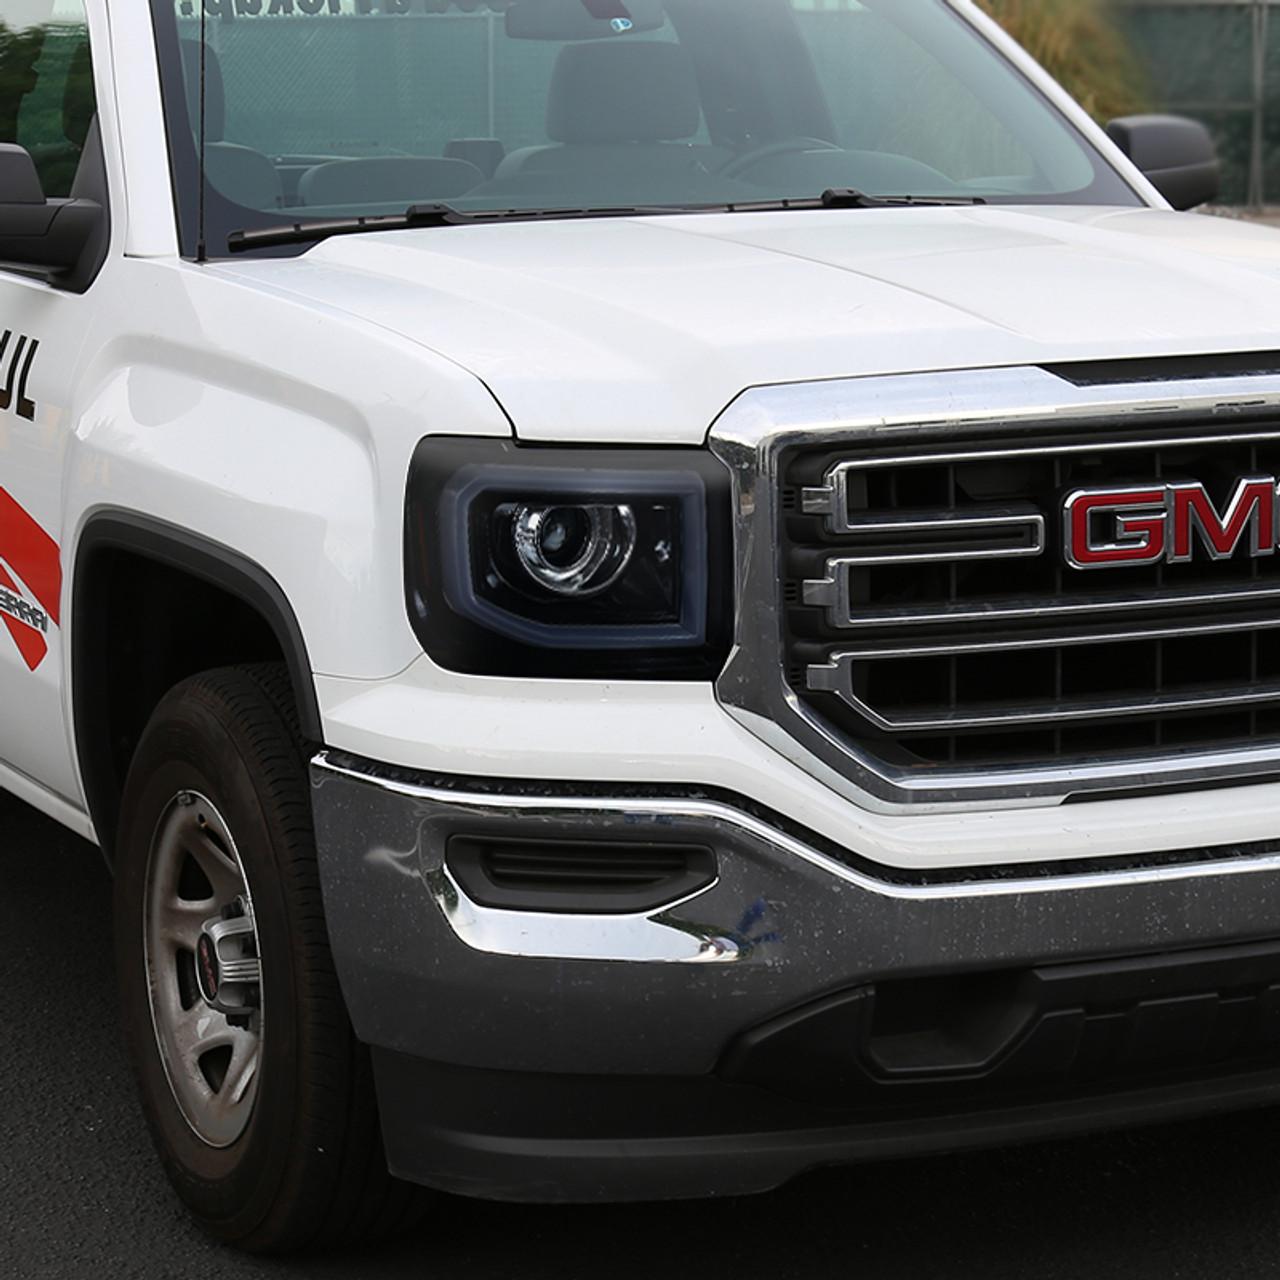 2014 2019 Gmc Sierra 1500 2500 3500 Led Bar Projector Headlights W Led Turn Signals Lights Glossy Black Housing Smoke Lens Spec D Tuning